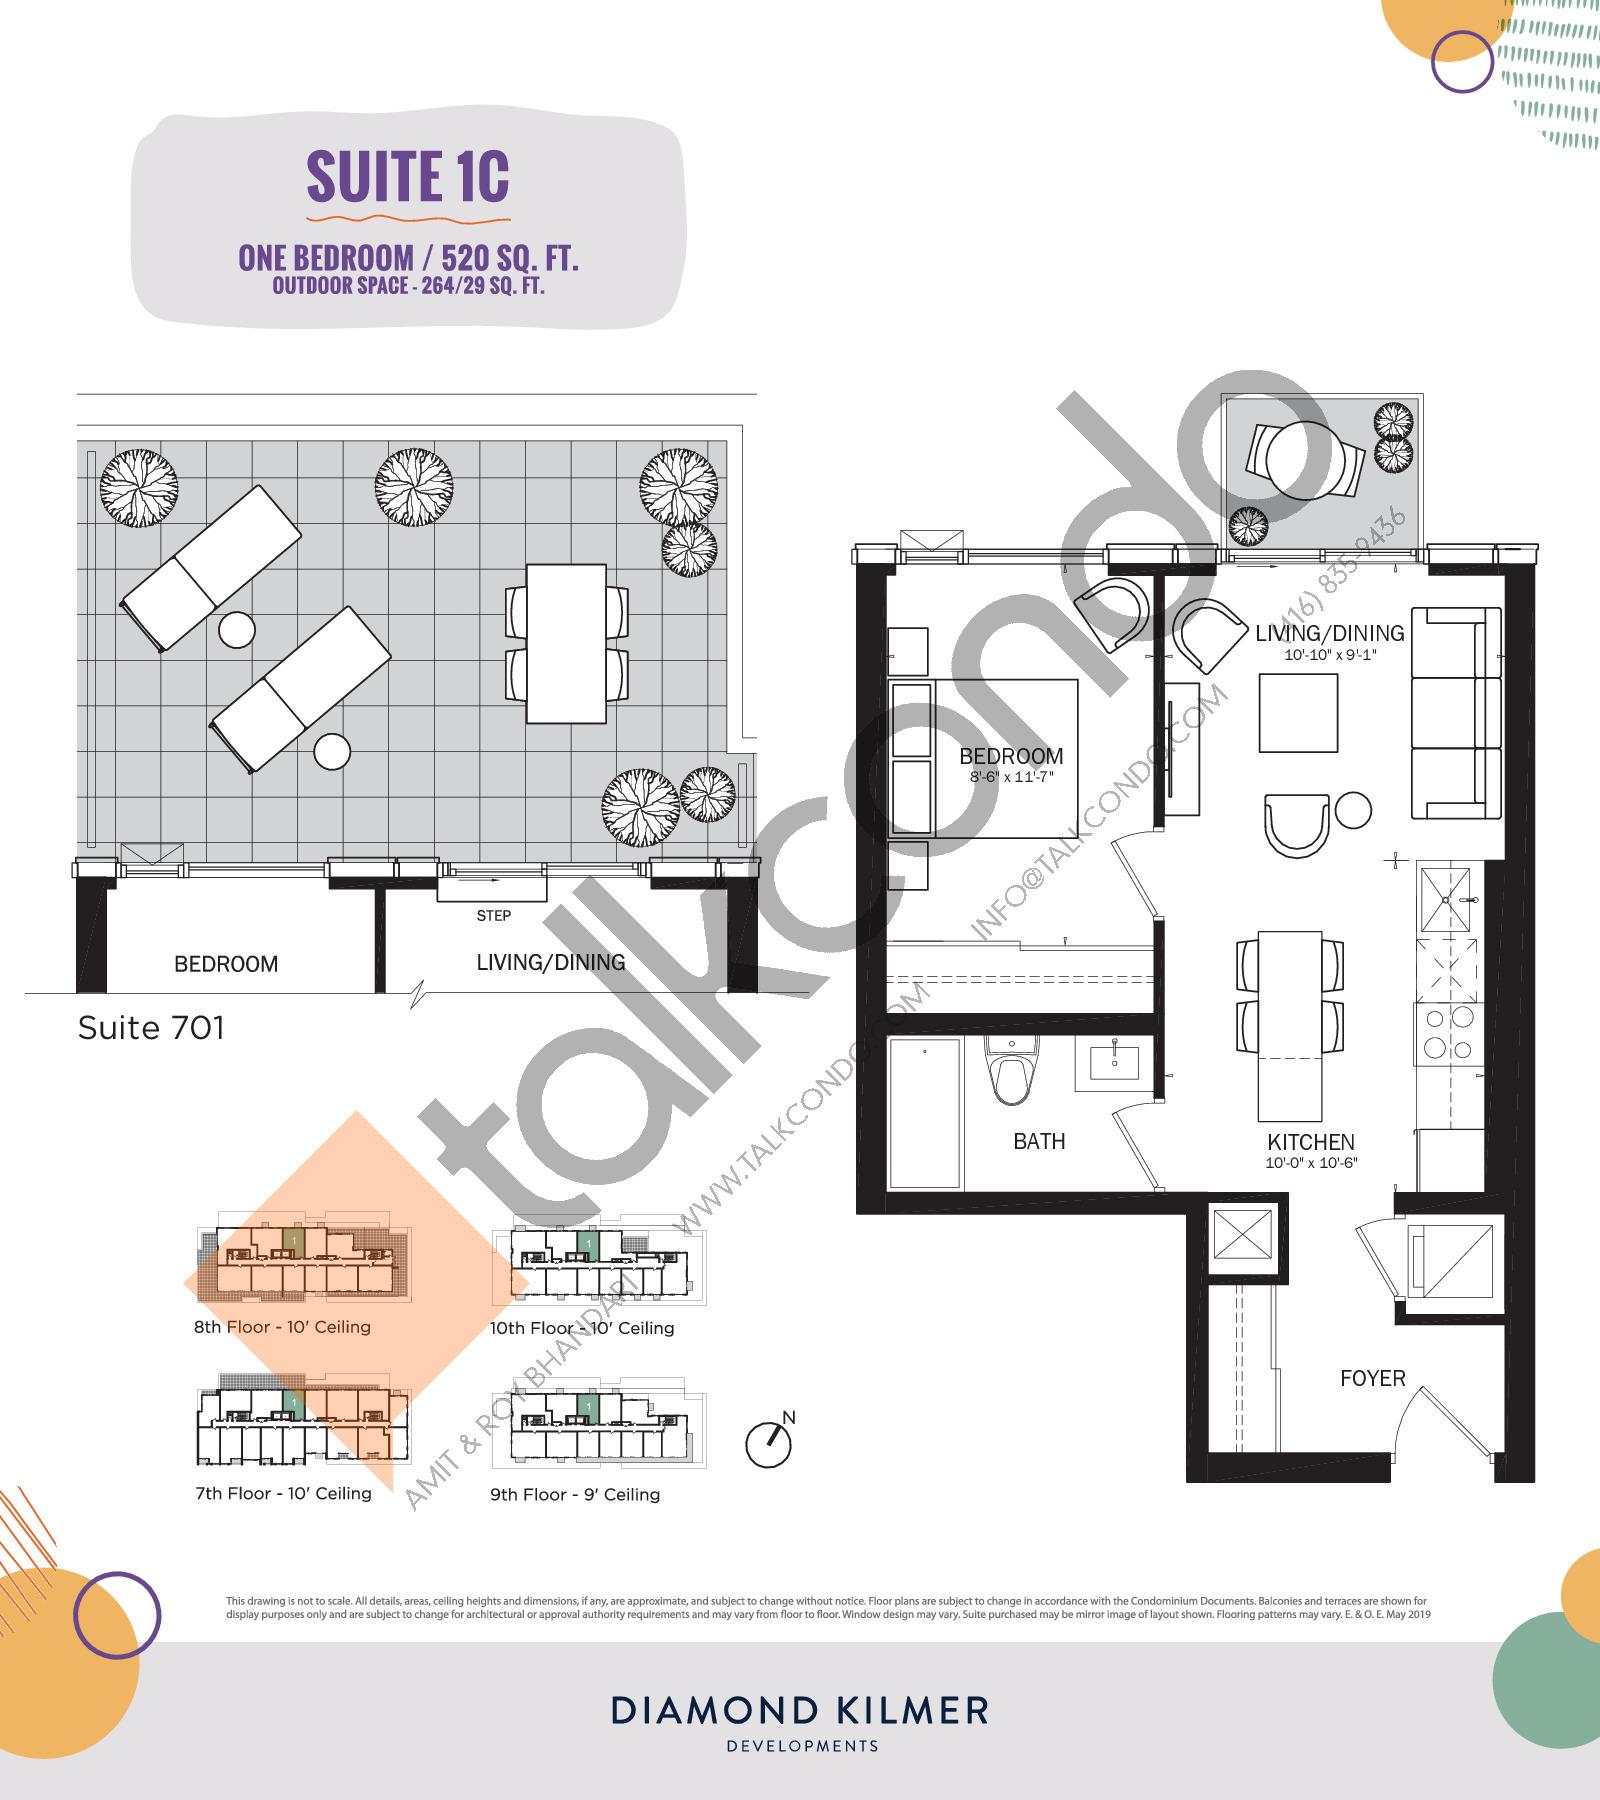 1C Floor Plan at Reunion Crossing Condos & Urban Towns - 520 sq.ft